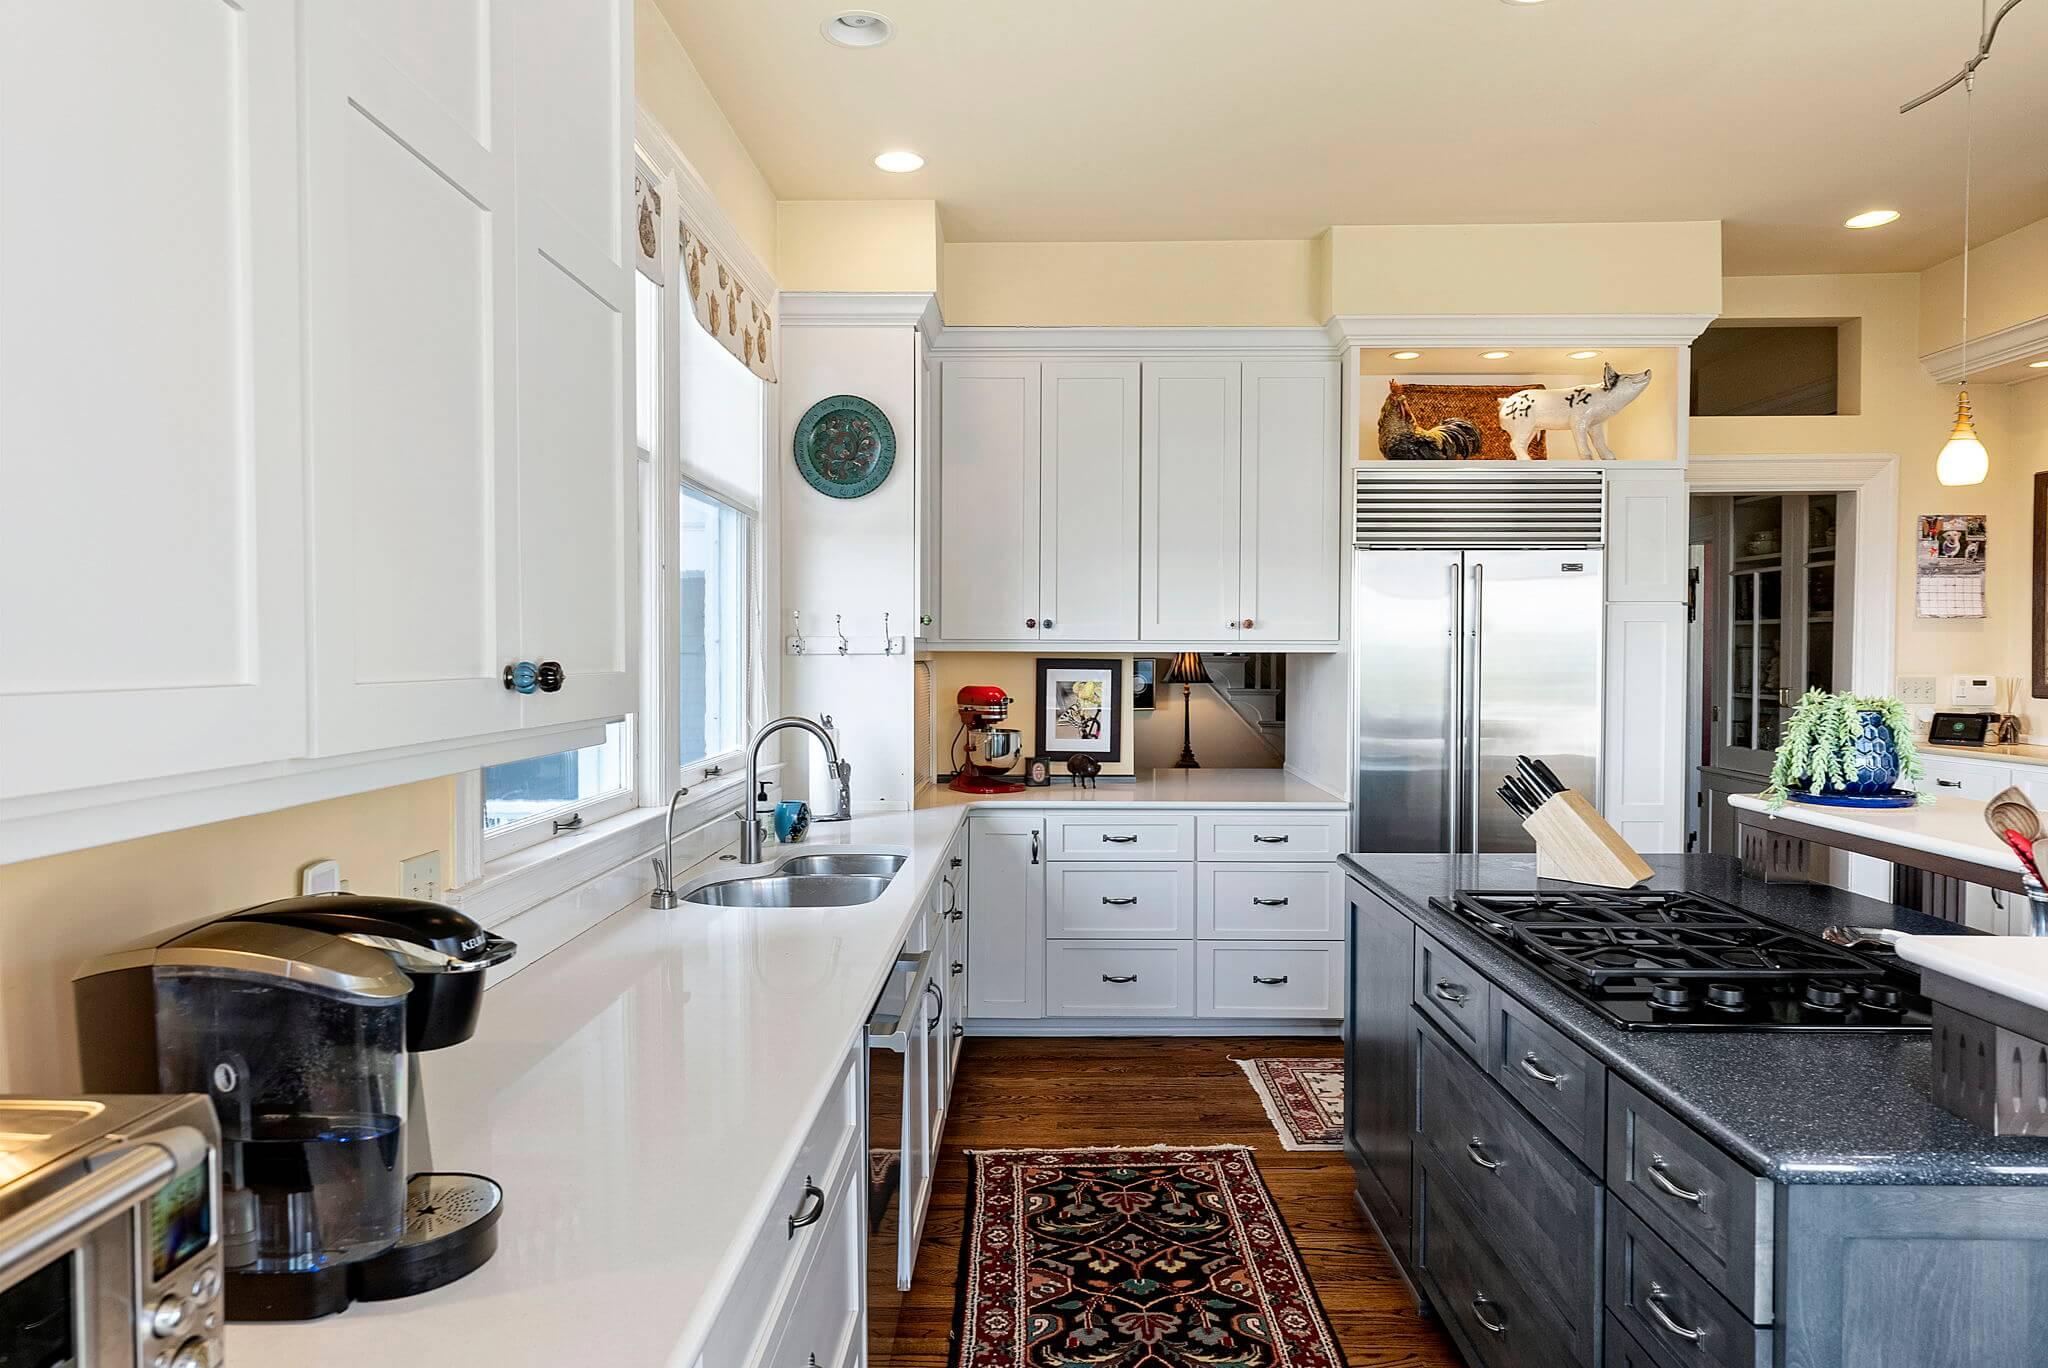 Gas cook top and Sub-Zero refrigerator